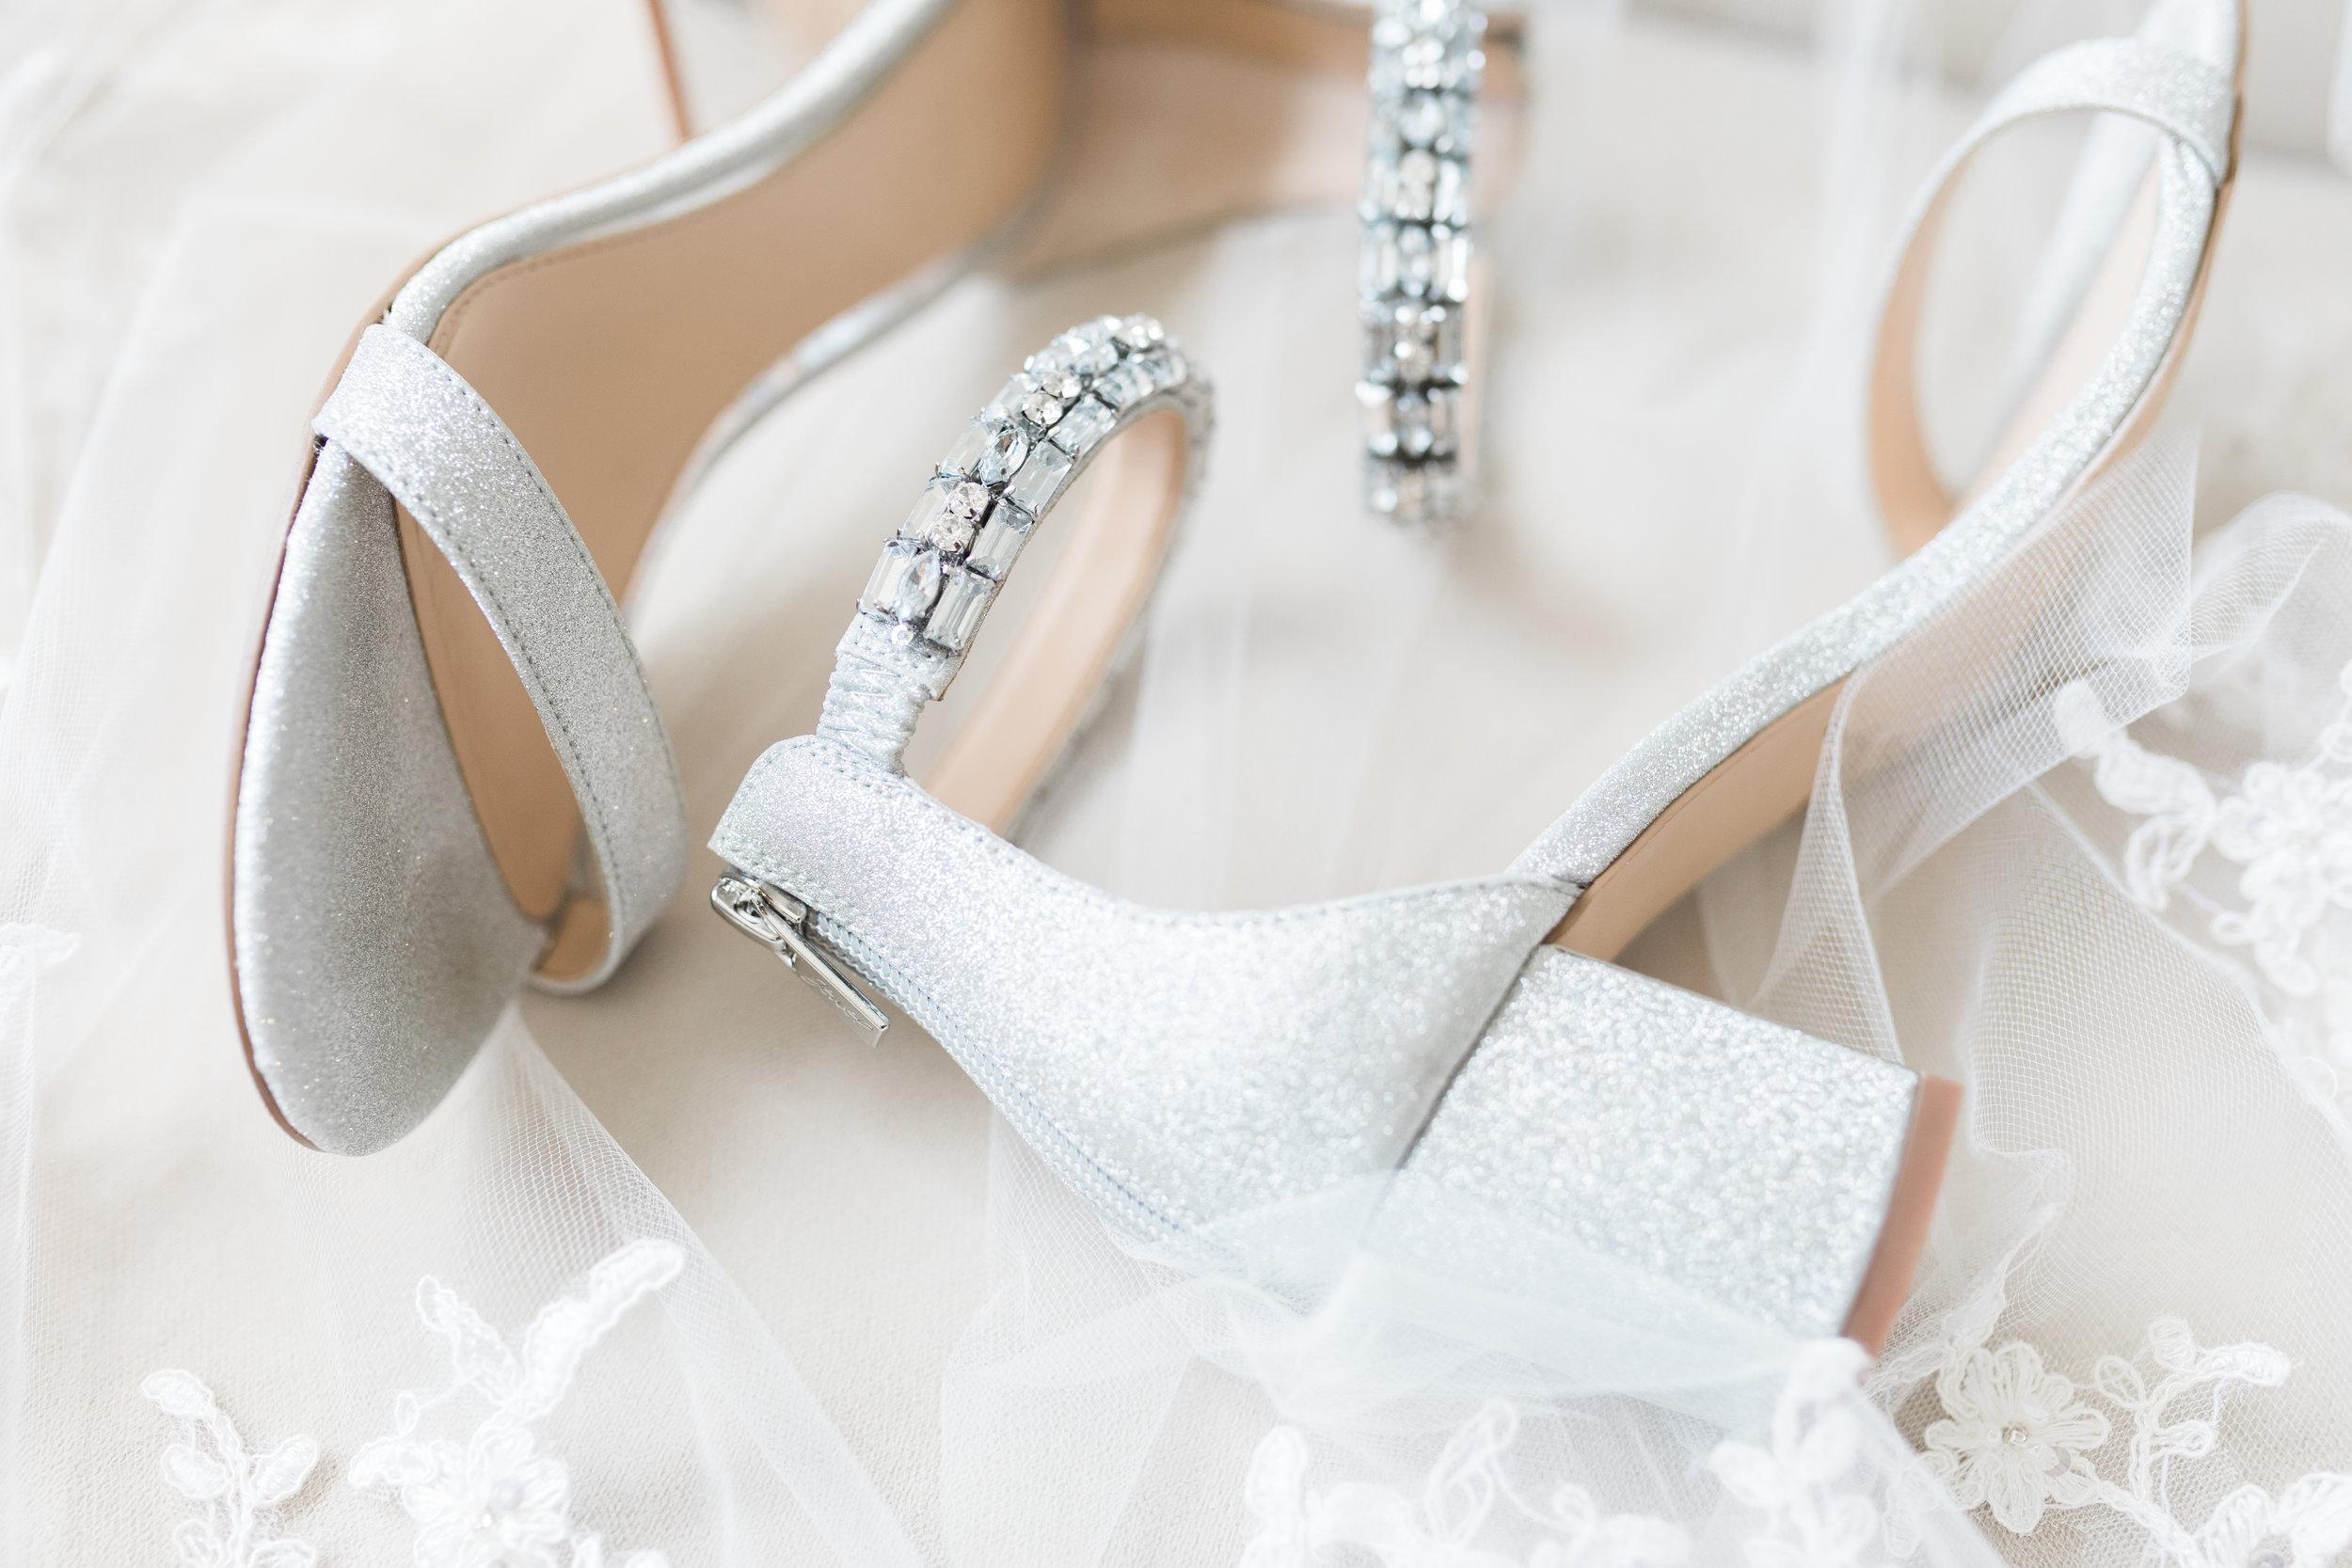 Alyssa-Parker-Photography-Kelly-Alex-Wedding-Details-76.jpg